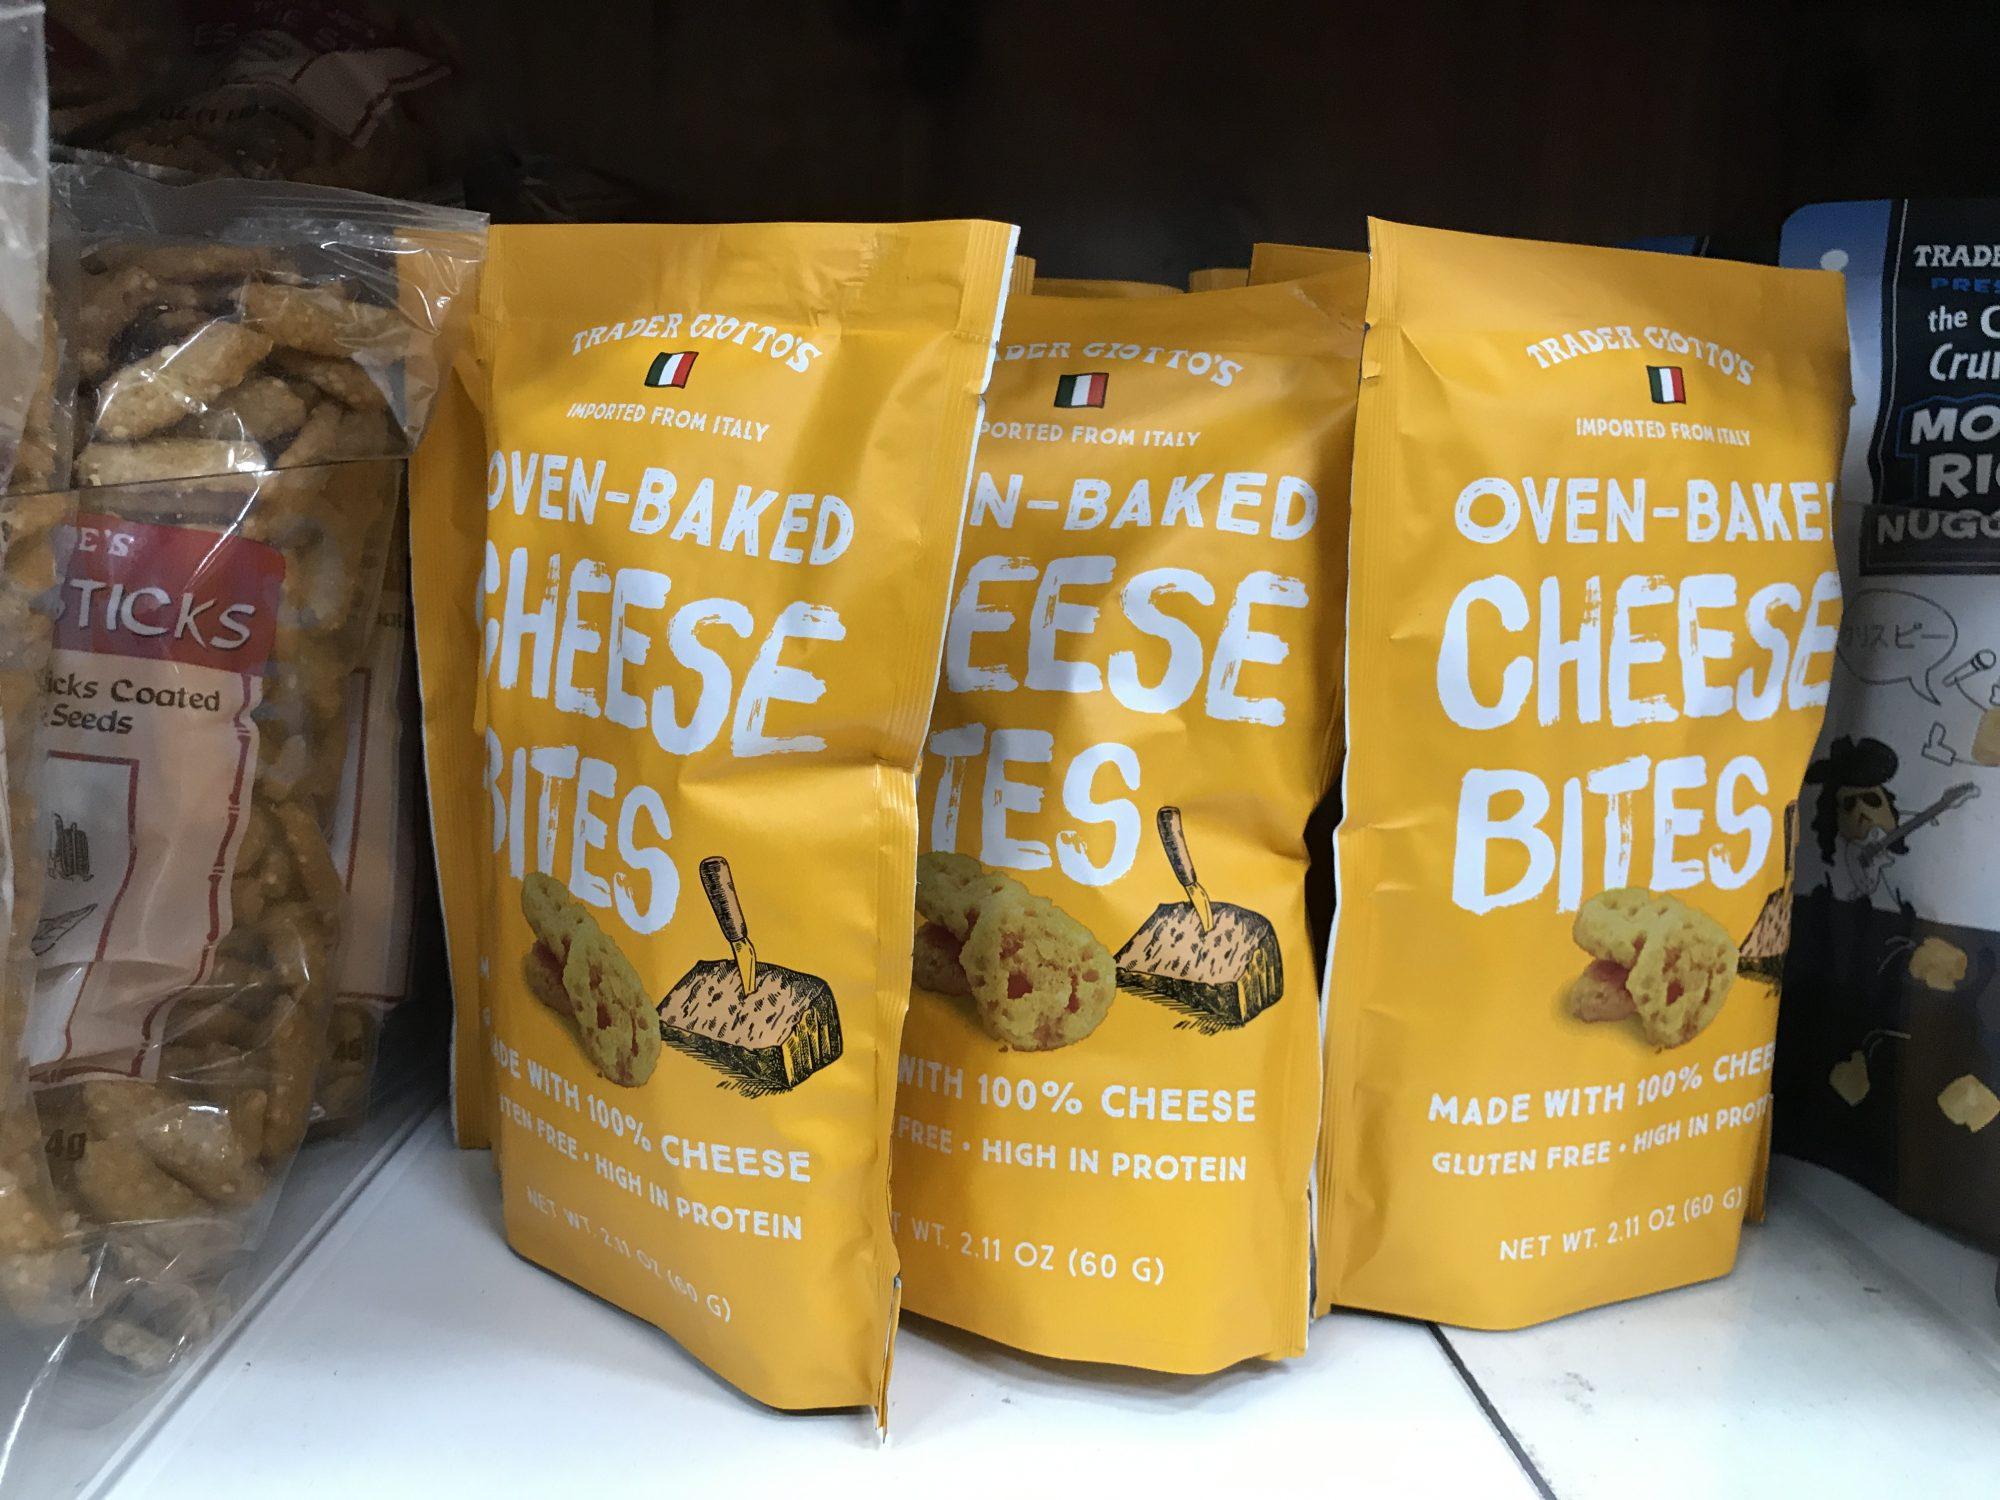 TJ Cheese Bites